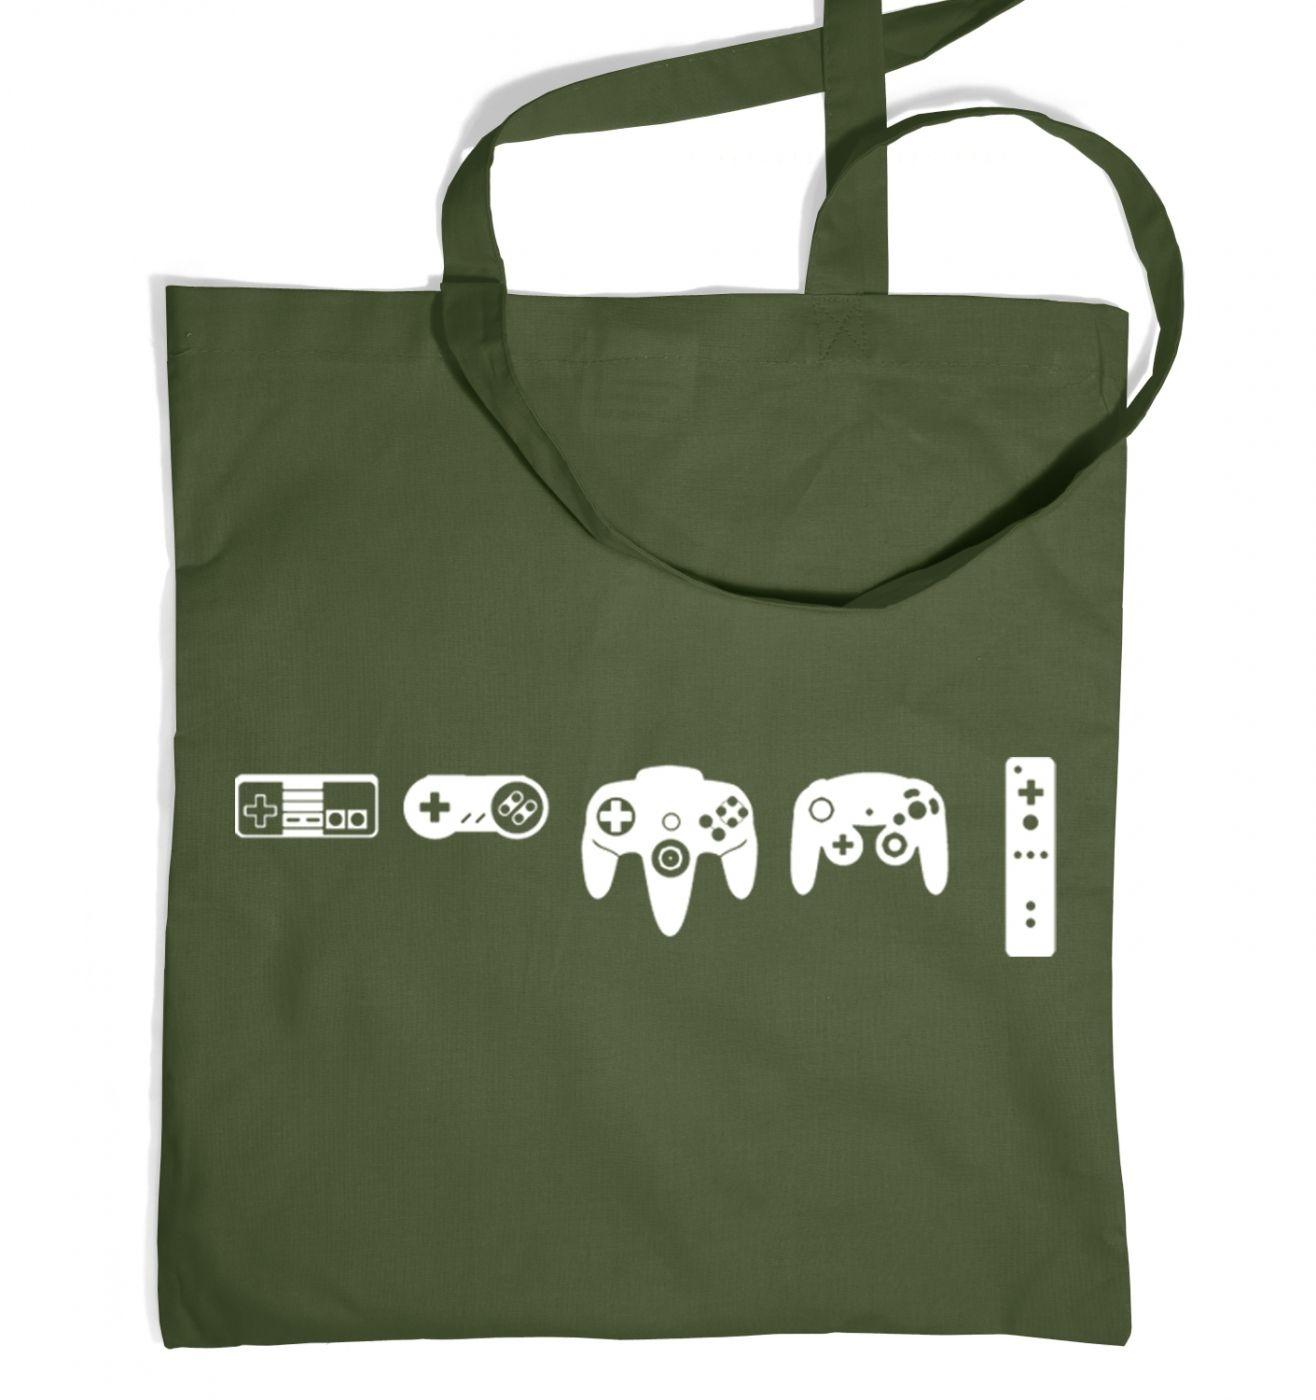 Evolution Of Nintendo tote bag